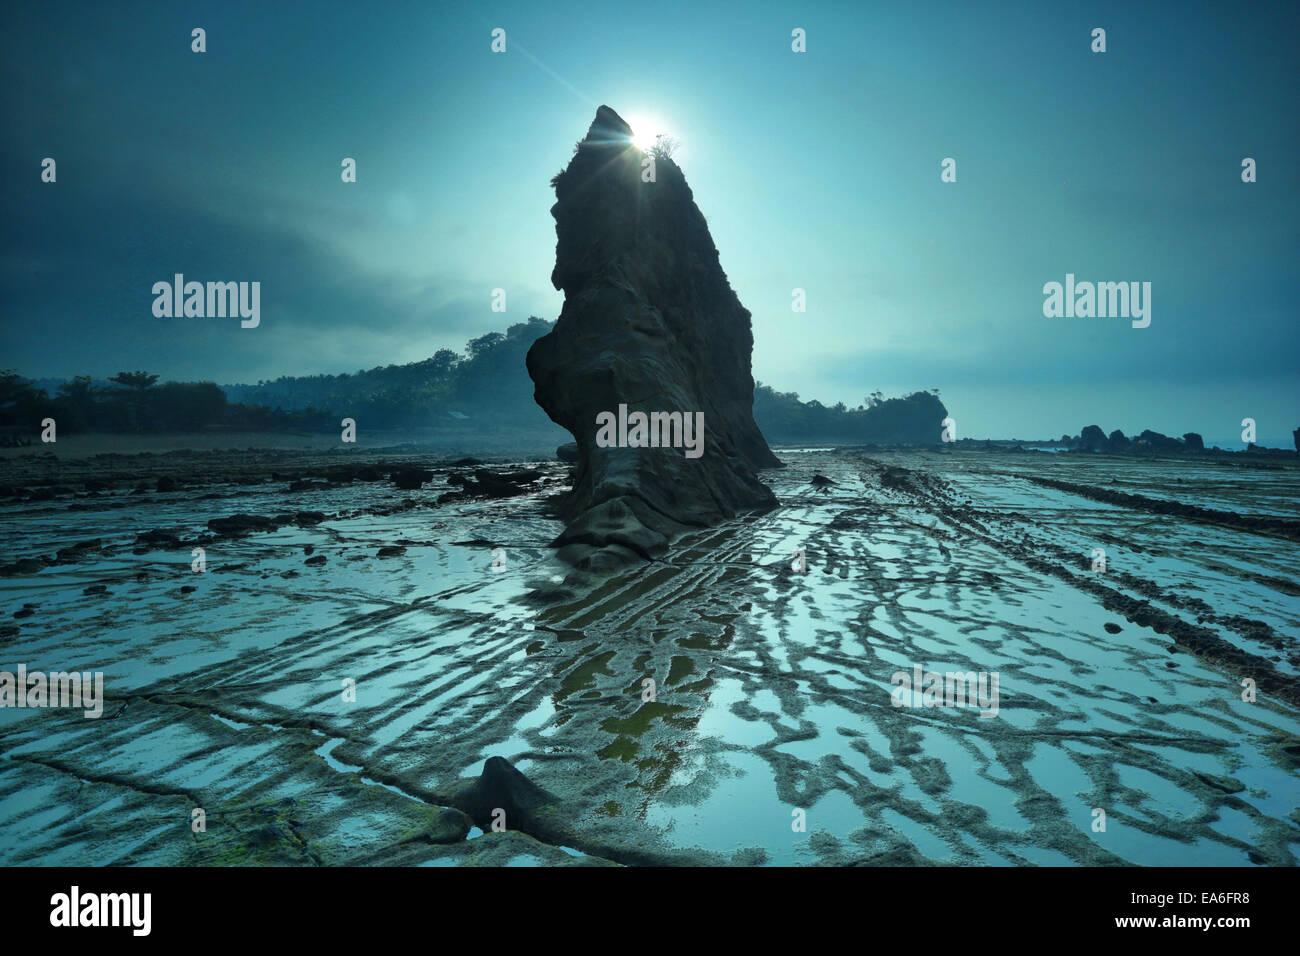 Indonesia, Sawarna, Tanjung Layar, View of rock formation - Stock Image